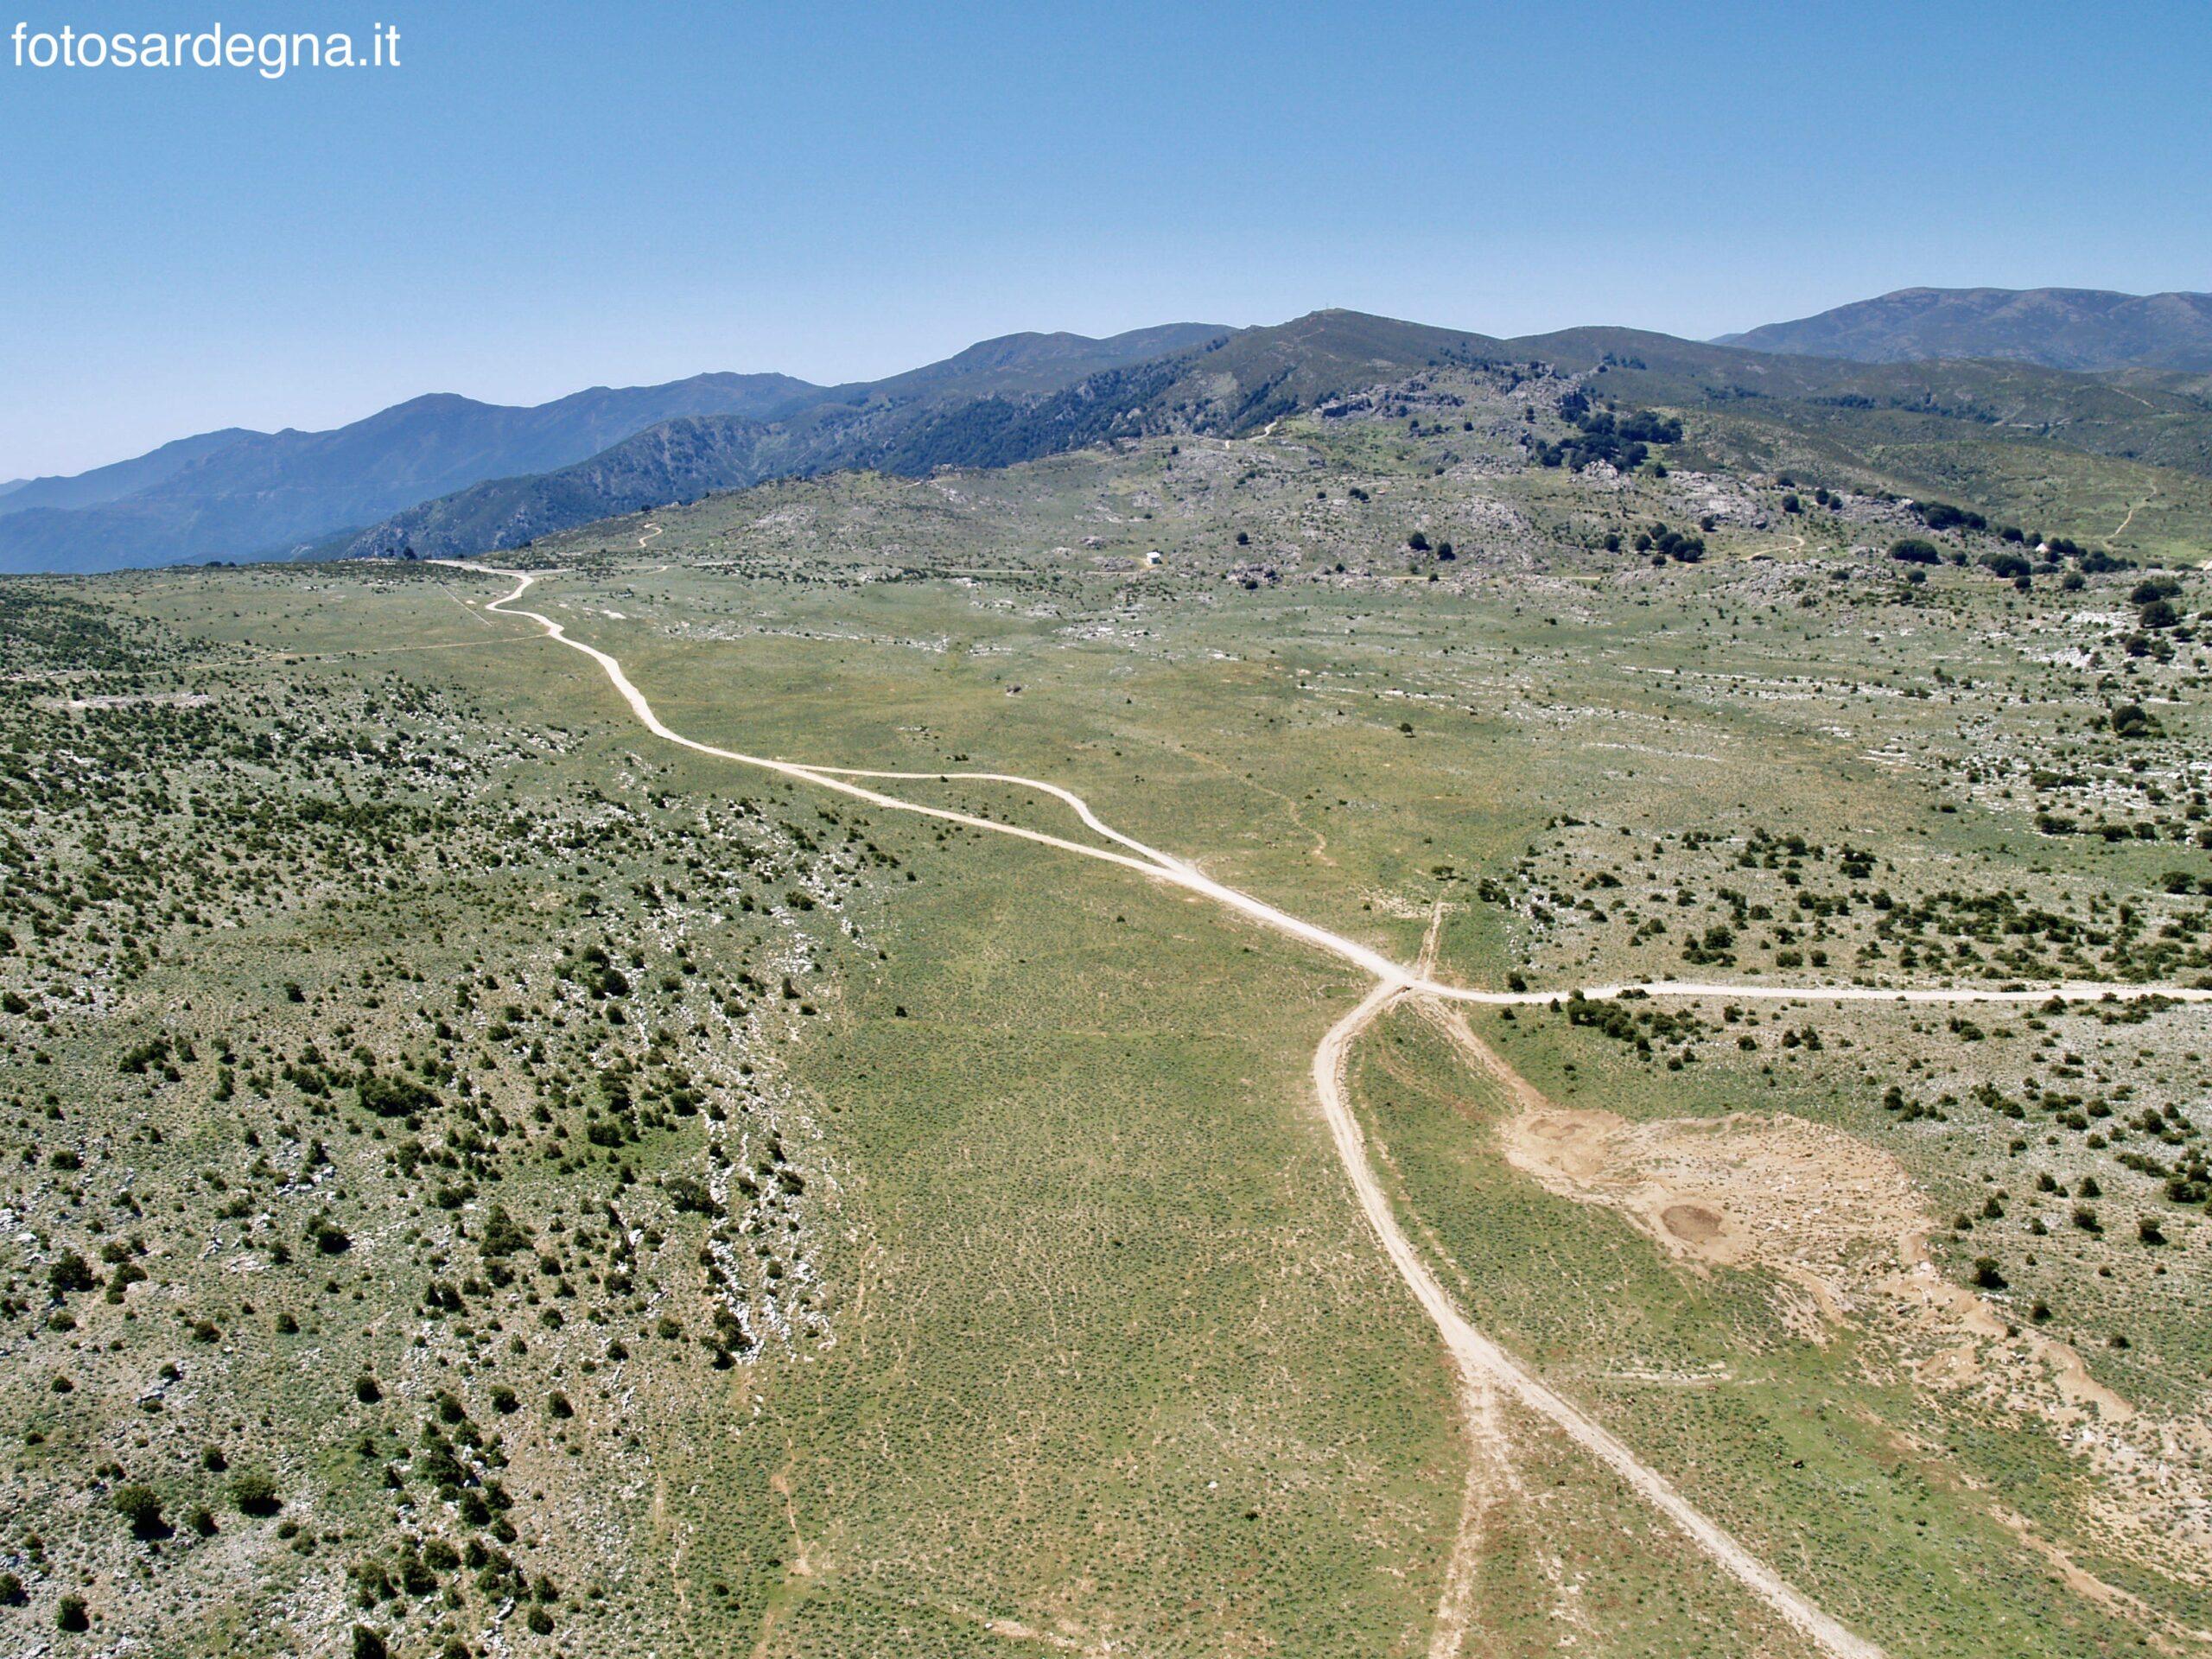 Vista aerea di Campu Oddeu verso sud; sullo sfondo Bruncu Pisucerbu, Monte Olinie, Monte Orguda, tutti abbondantemente sopra i 1.300 metri d'altezza.